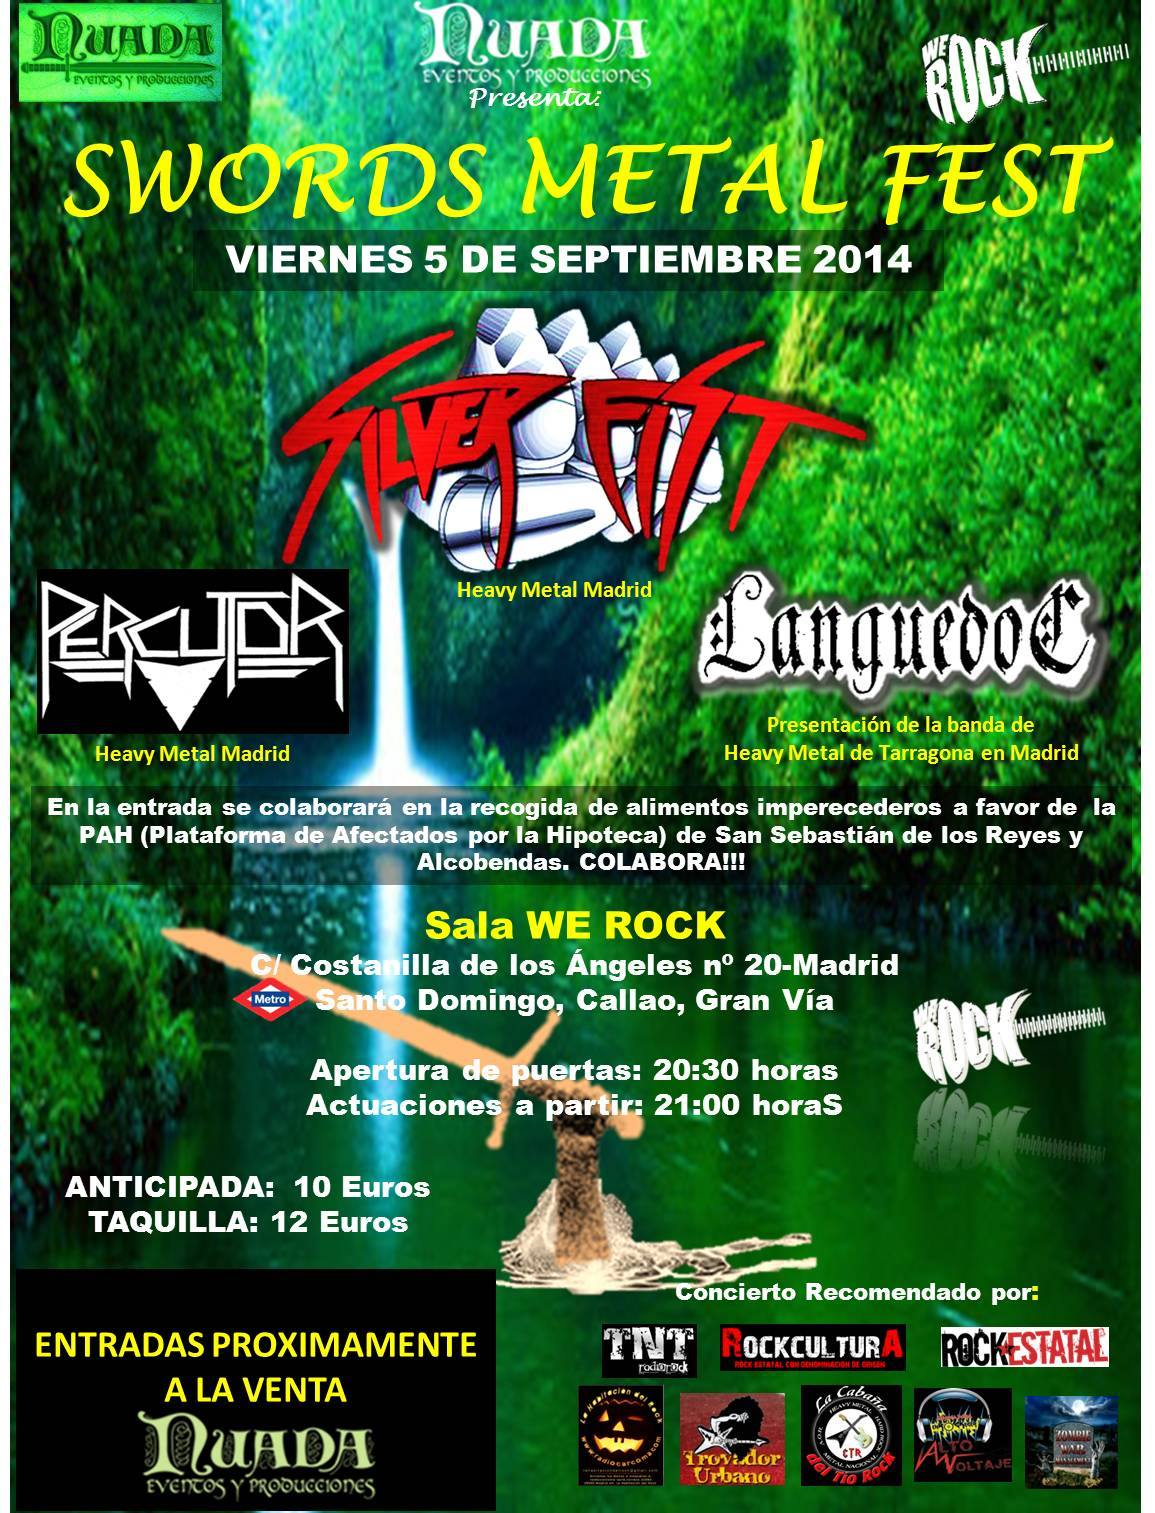 Sword Metal Fest